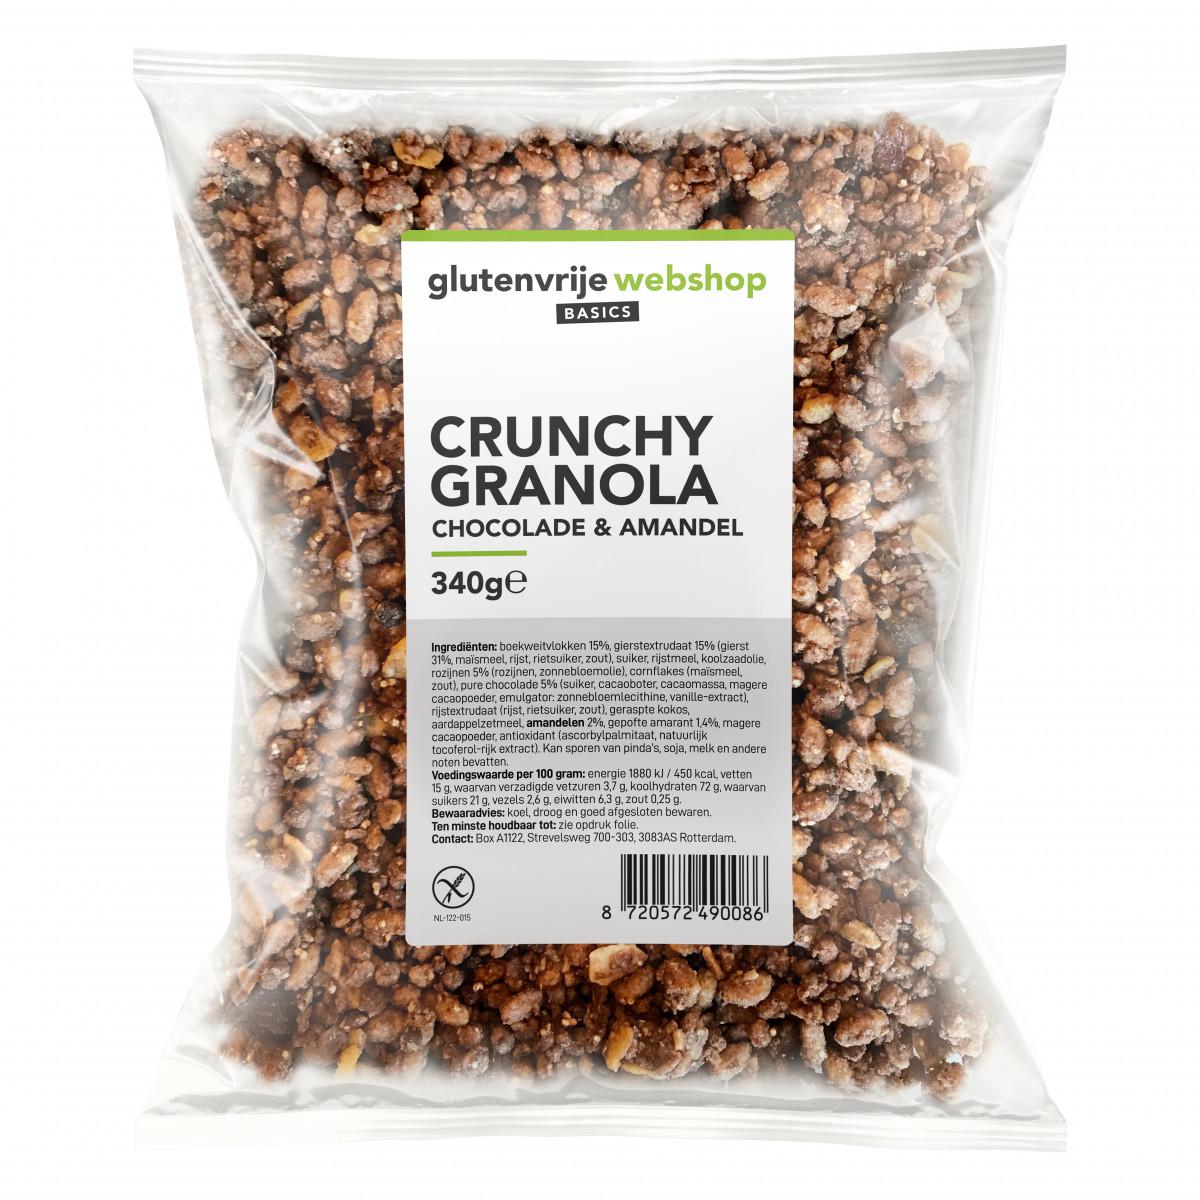 Crunchy Granola Chocolade & Amandel